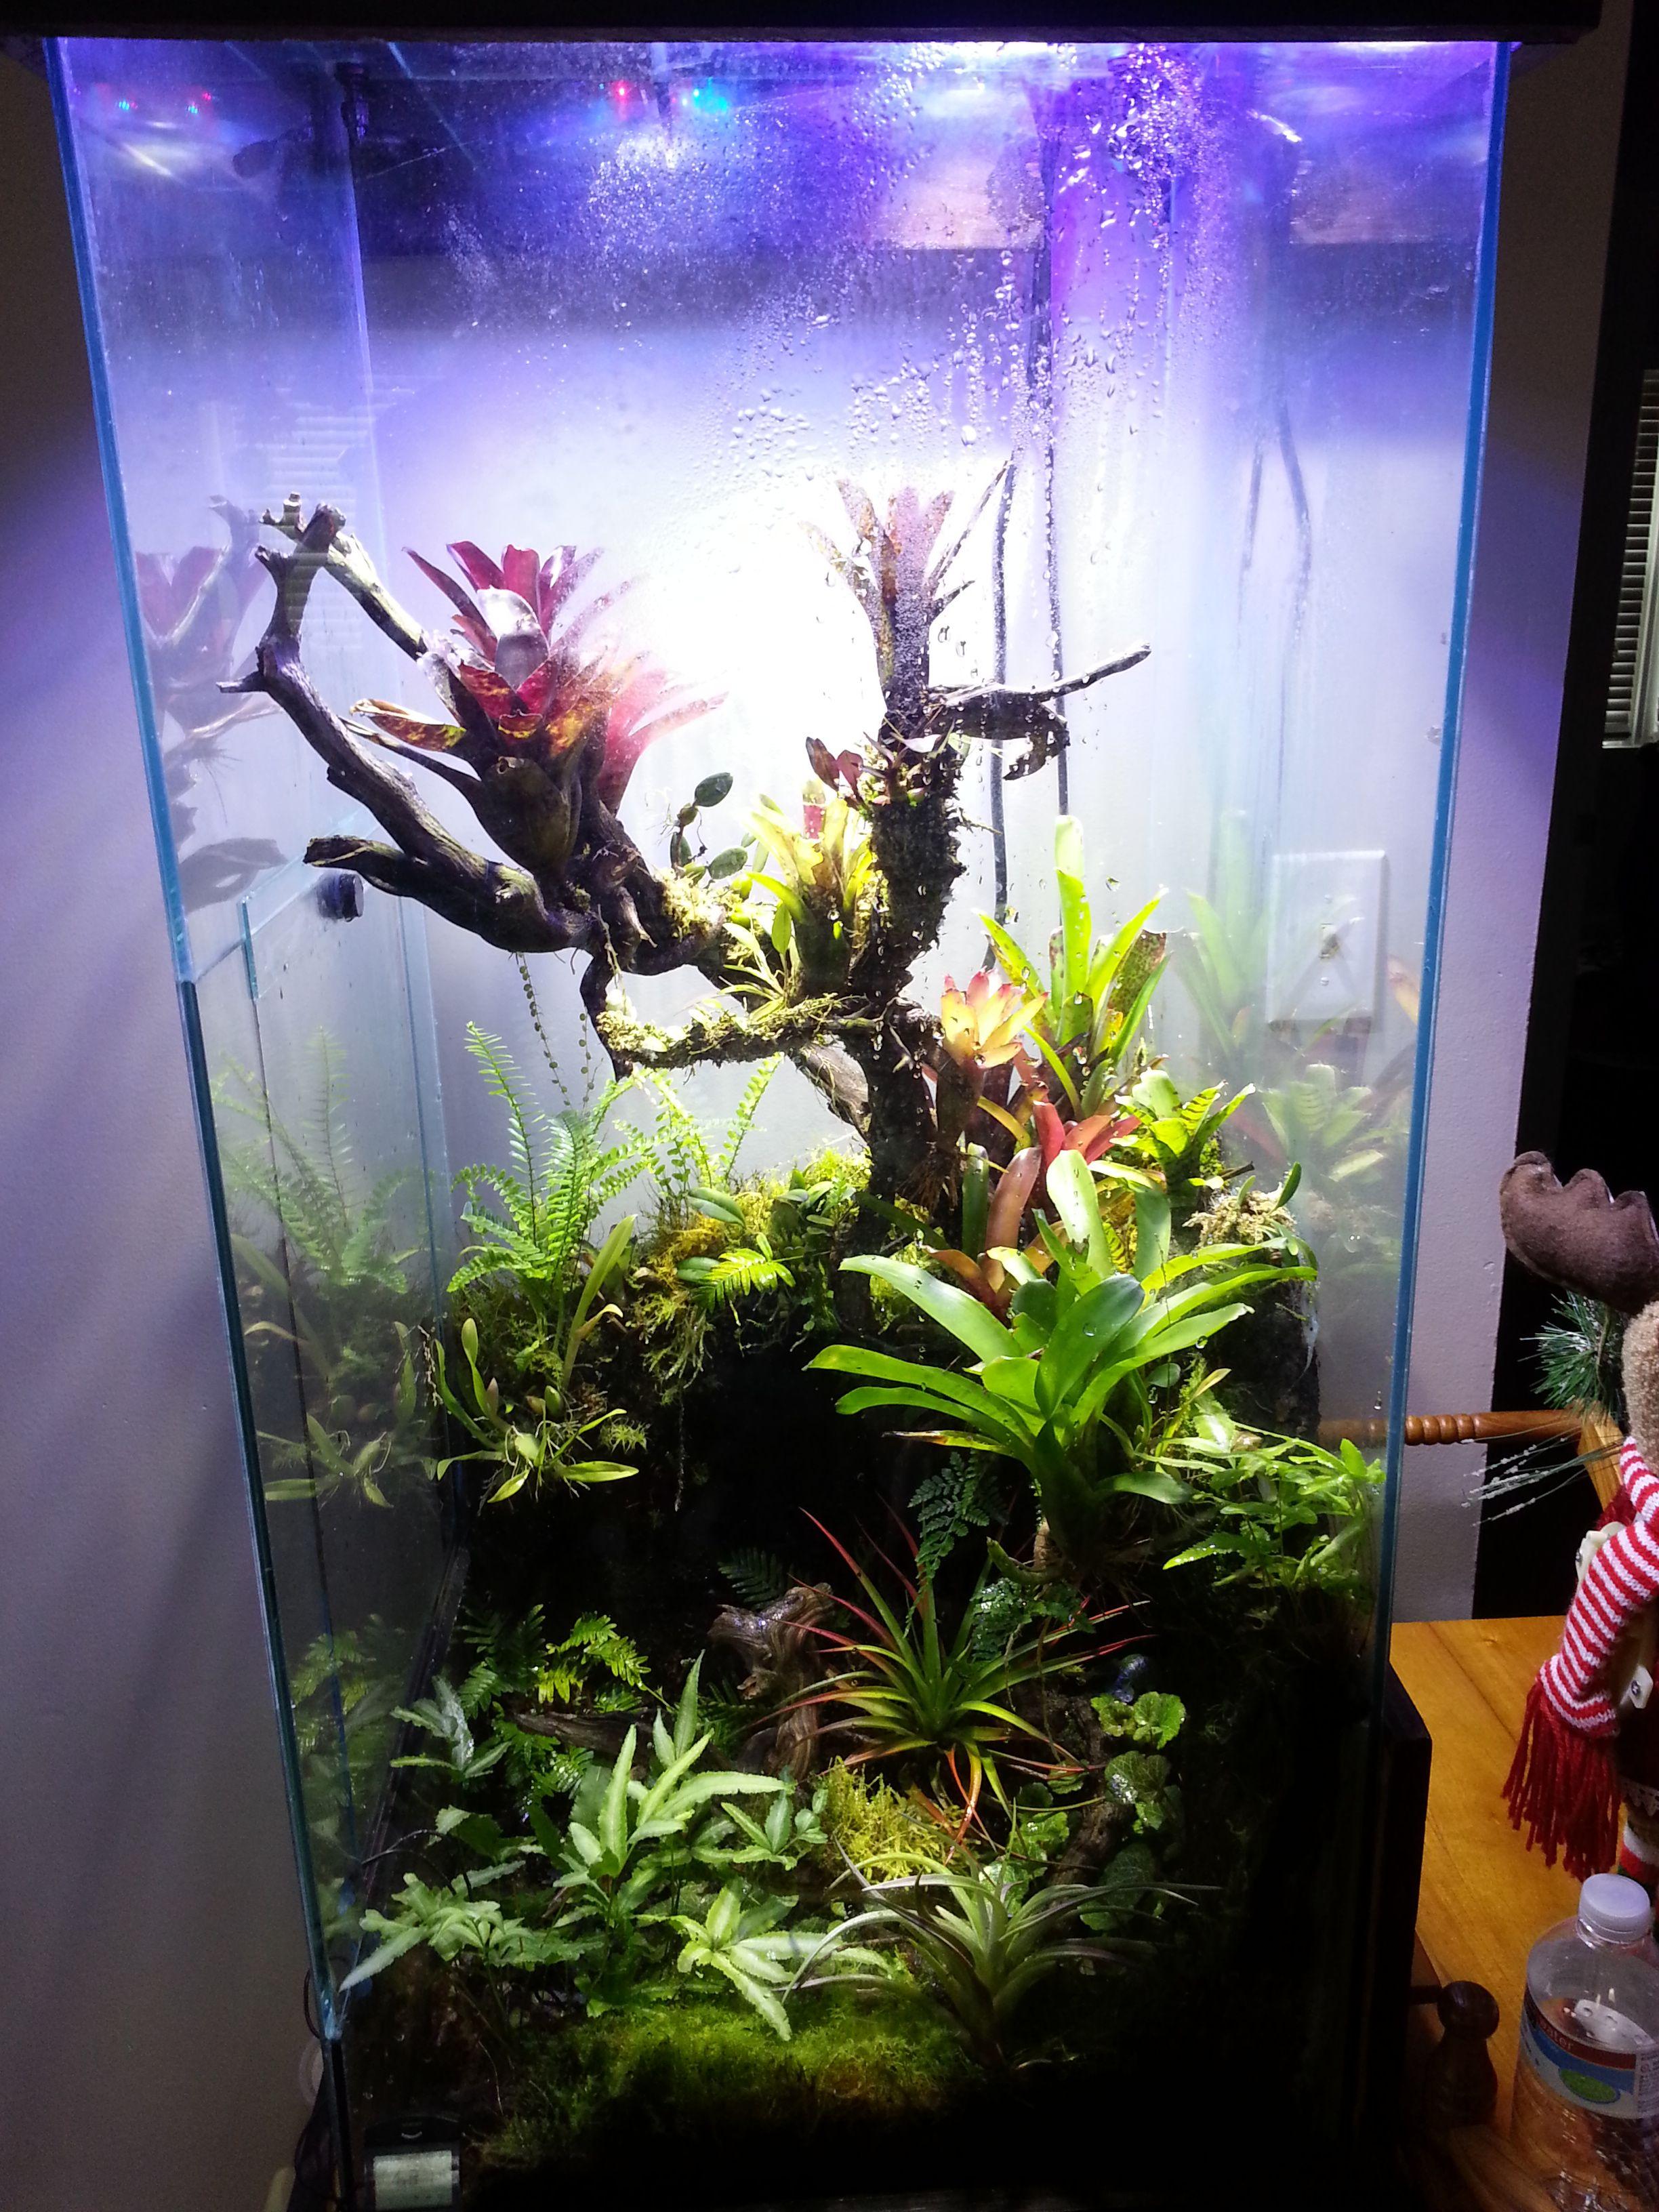 Giga 39 s vivarium vivarium inspiration pinterest for Fish tank frogs